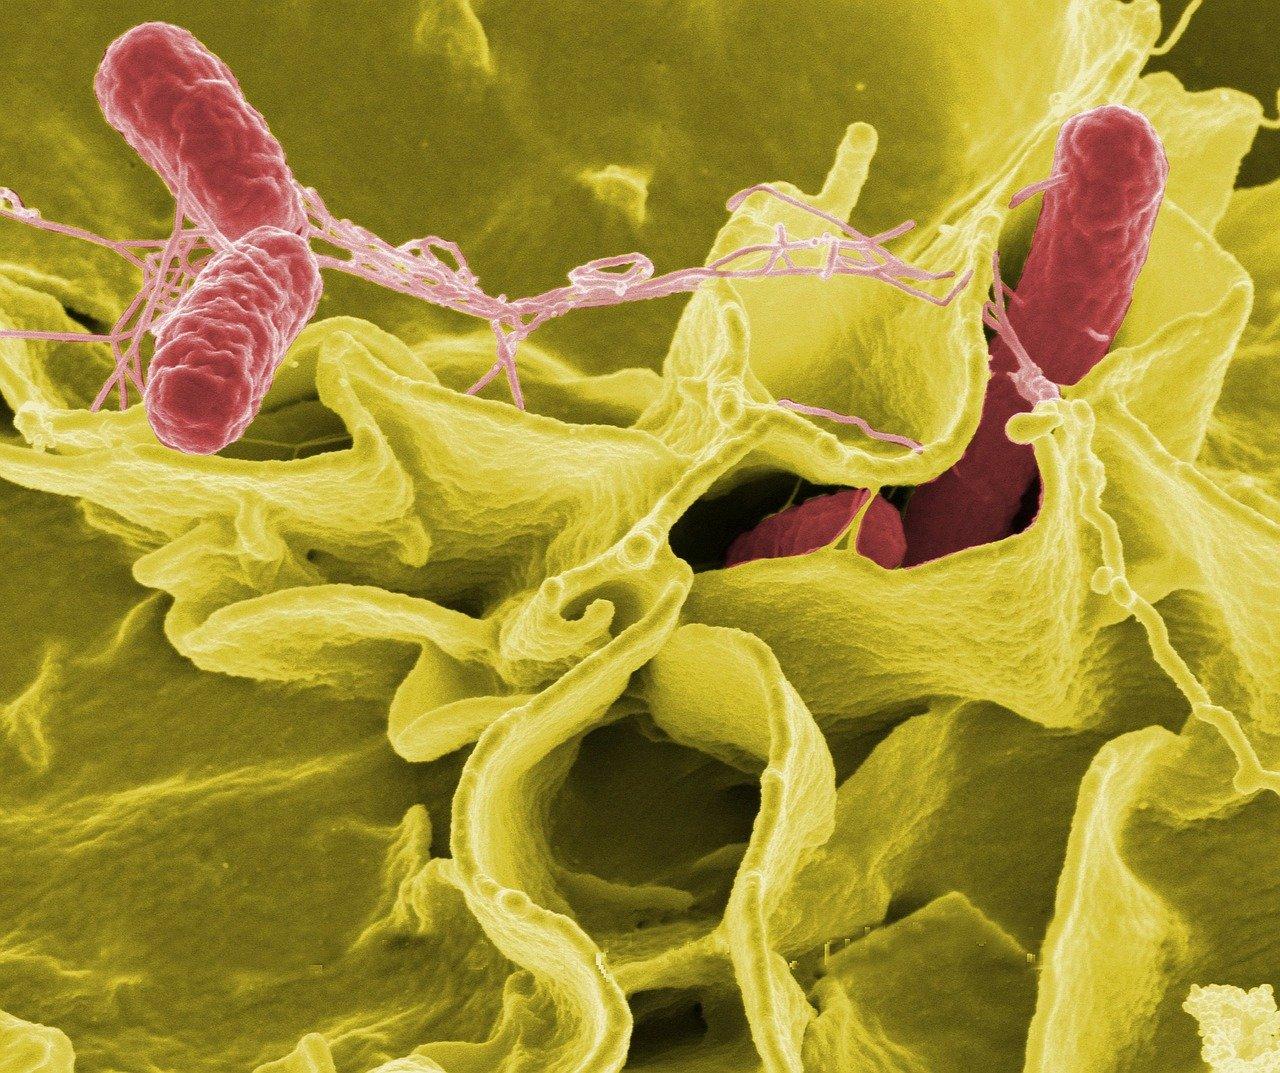 bacteria, salmonella, pathogens